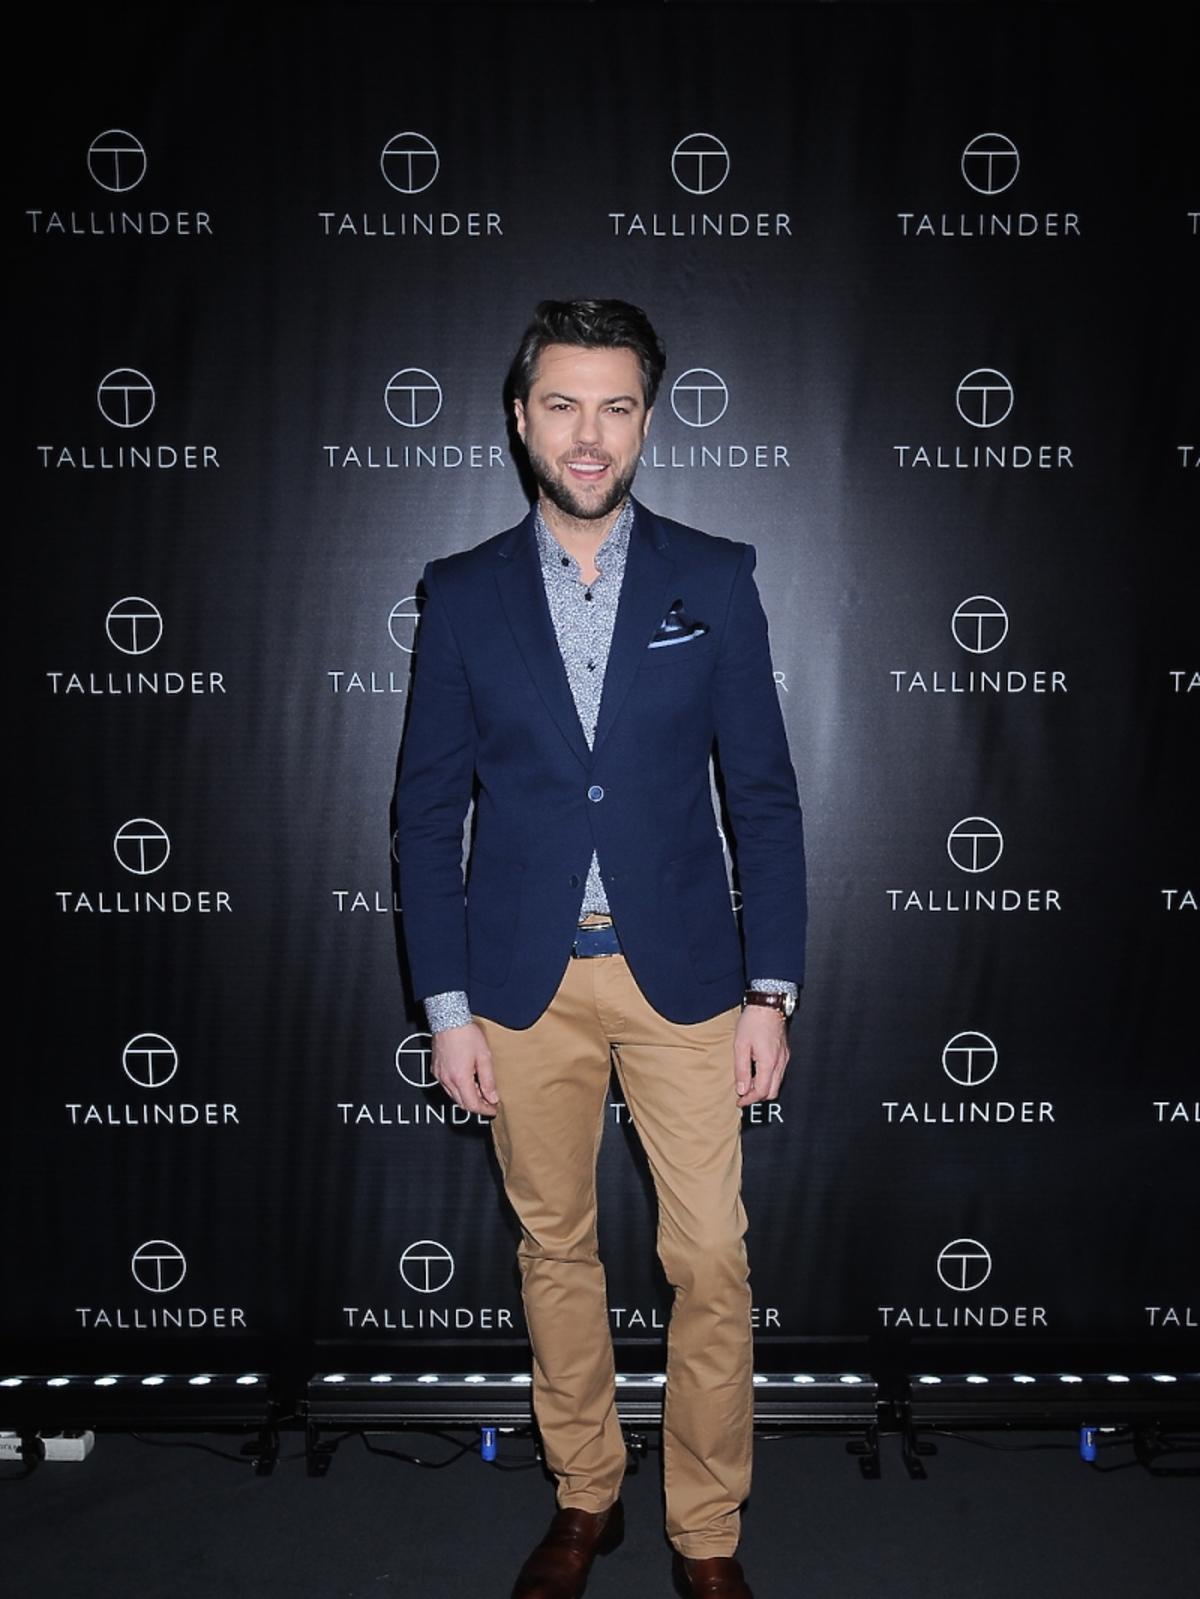 Olivier Janiak na prezentacji marki Tallinder